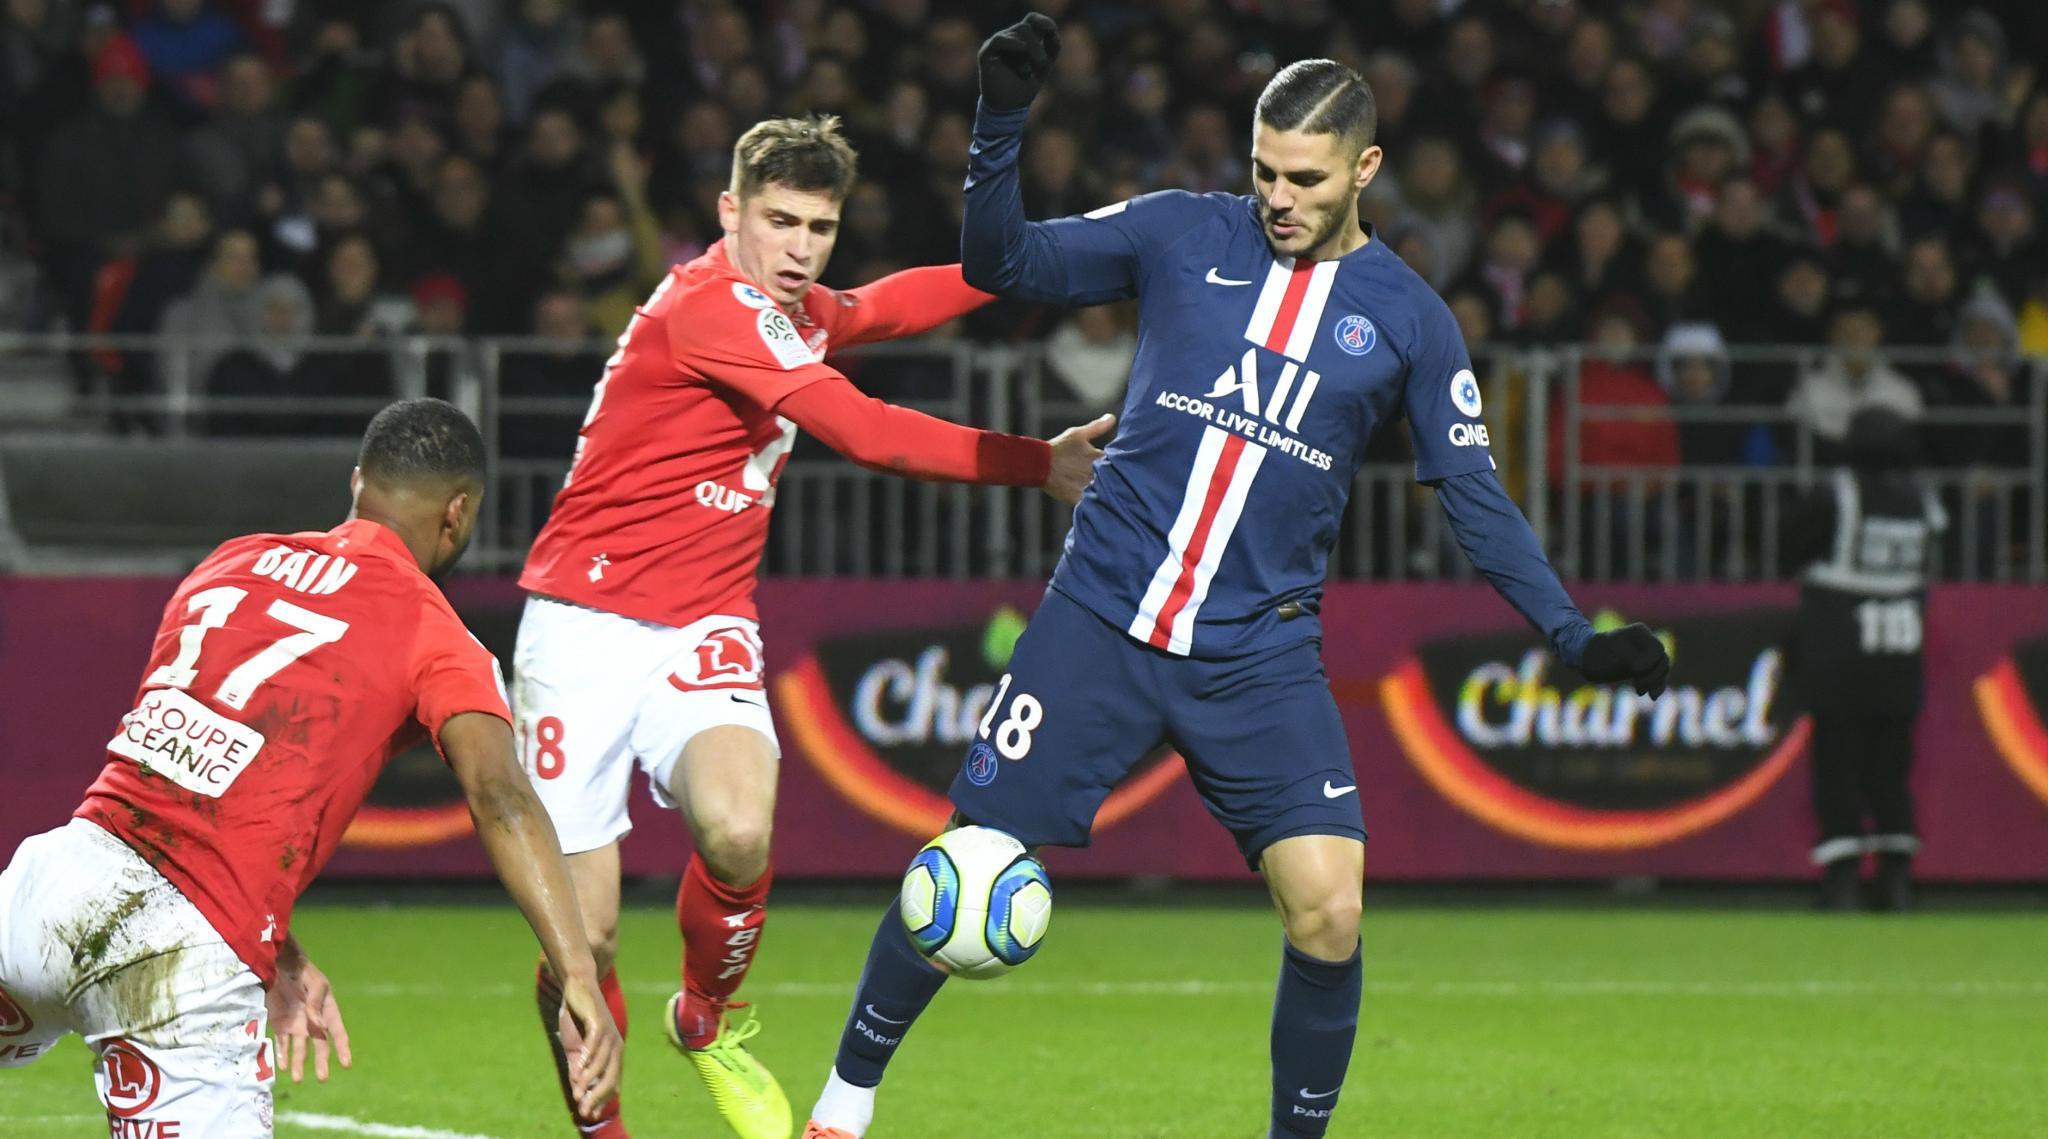 مشاهدة مباراة باريس سان جيرمان وبريست